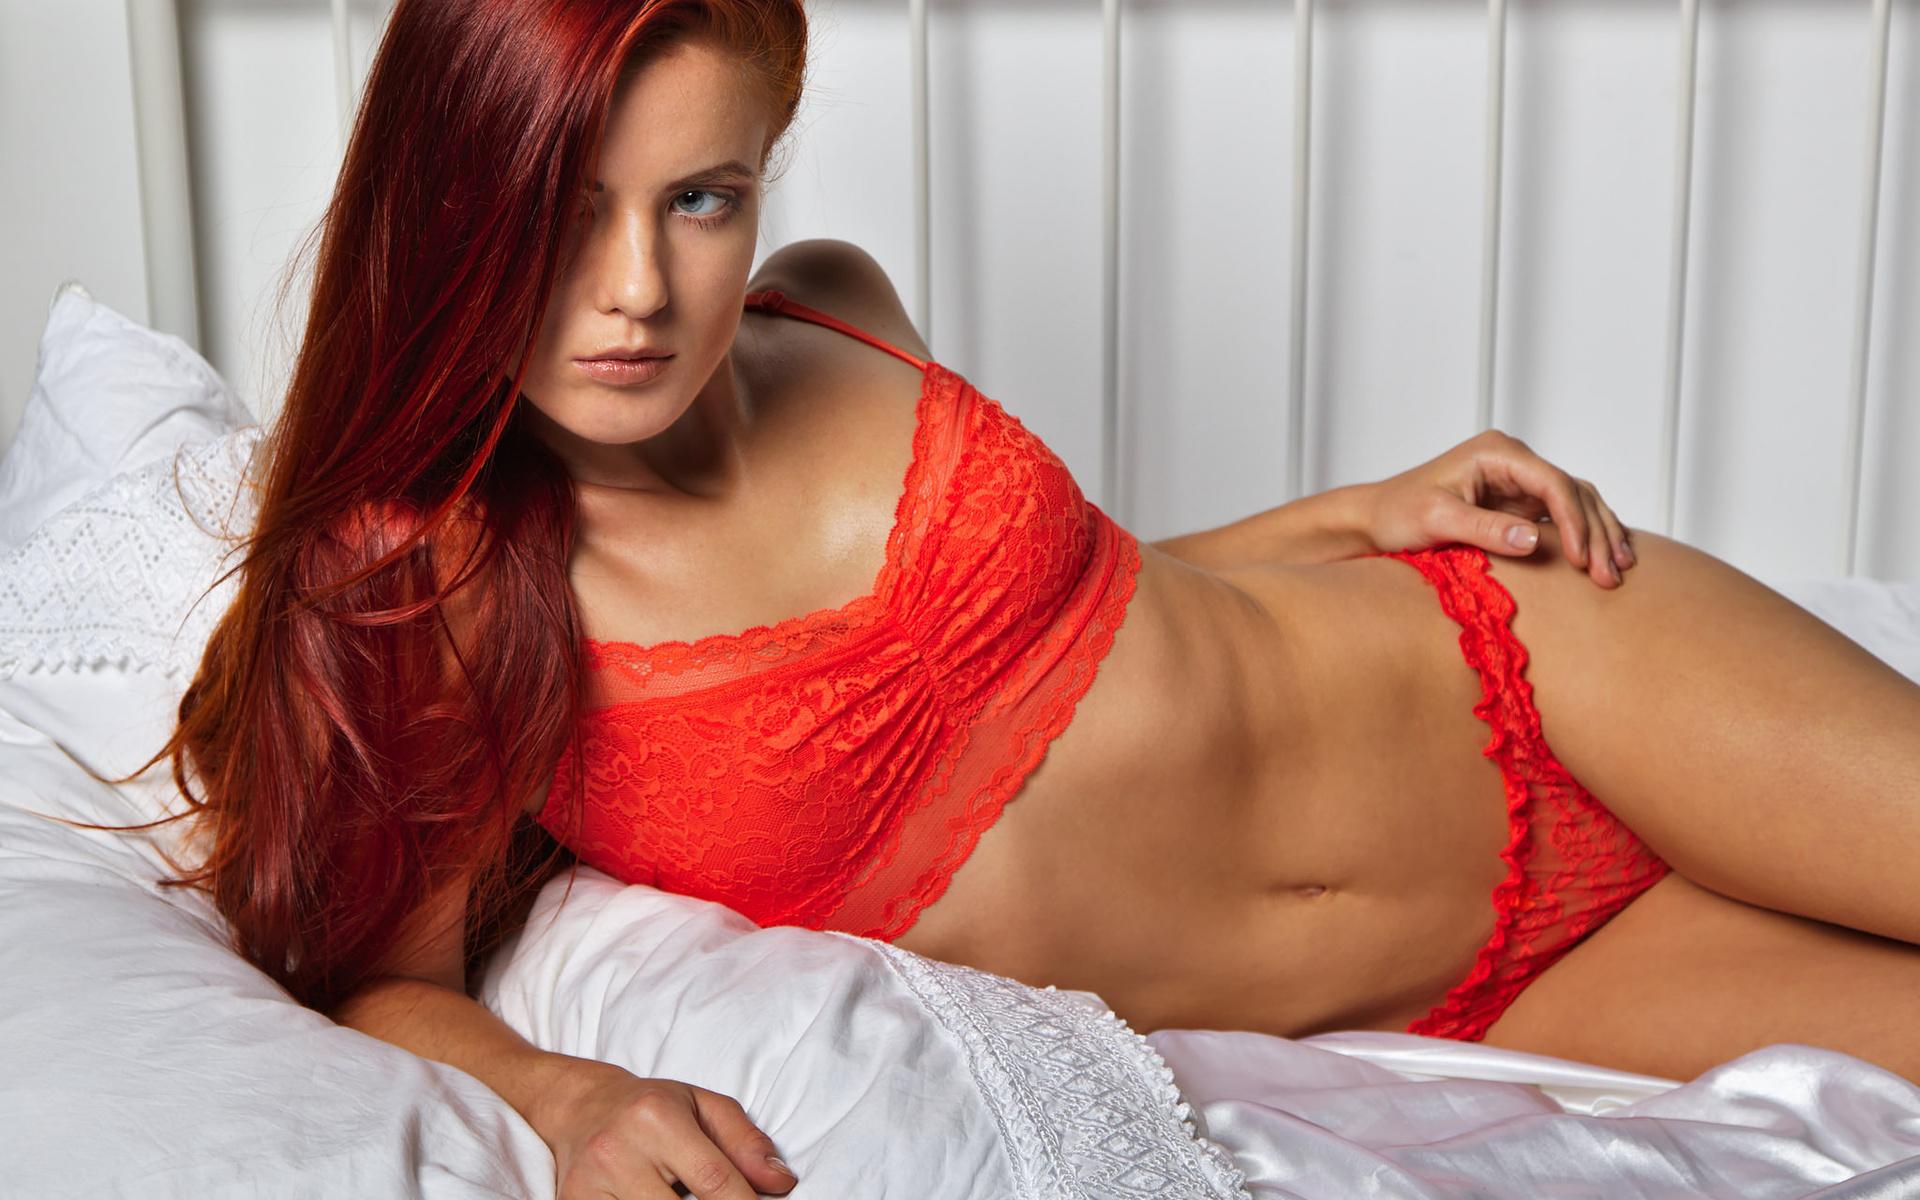 redhead-women-in-bed